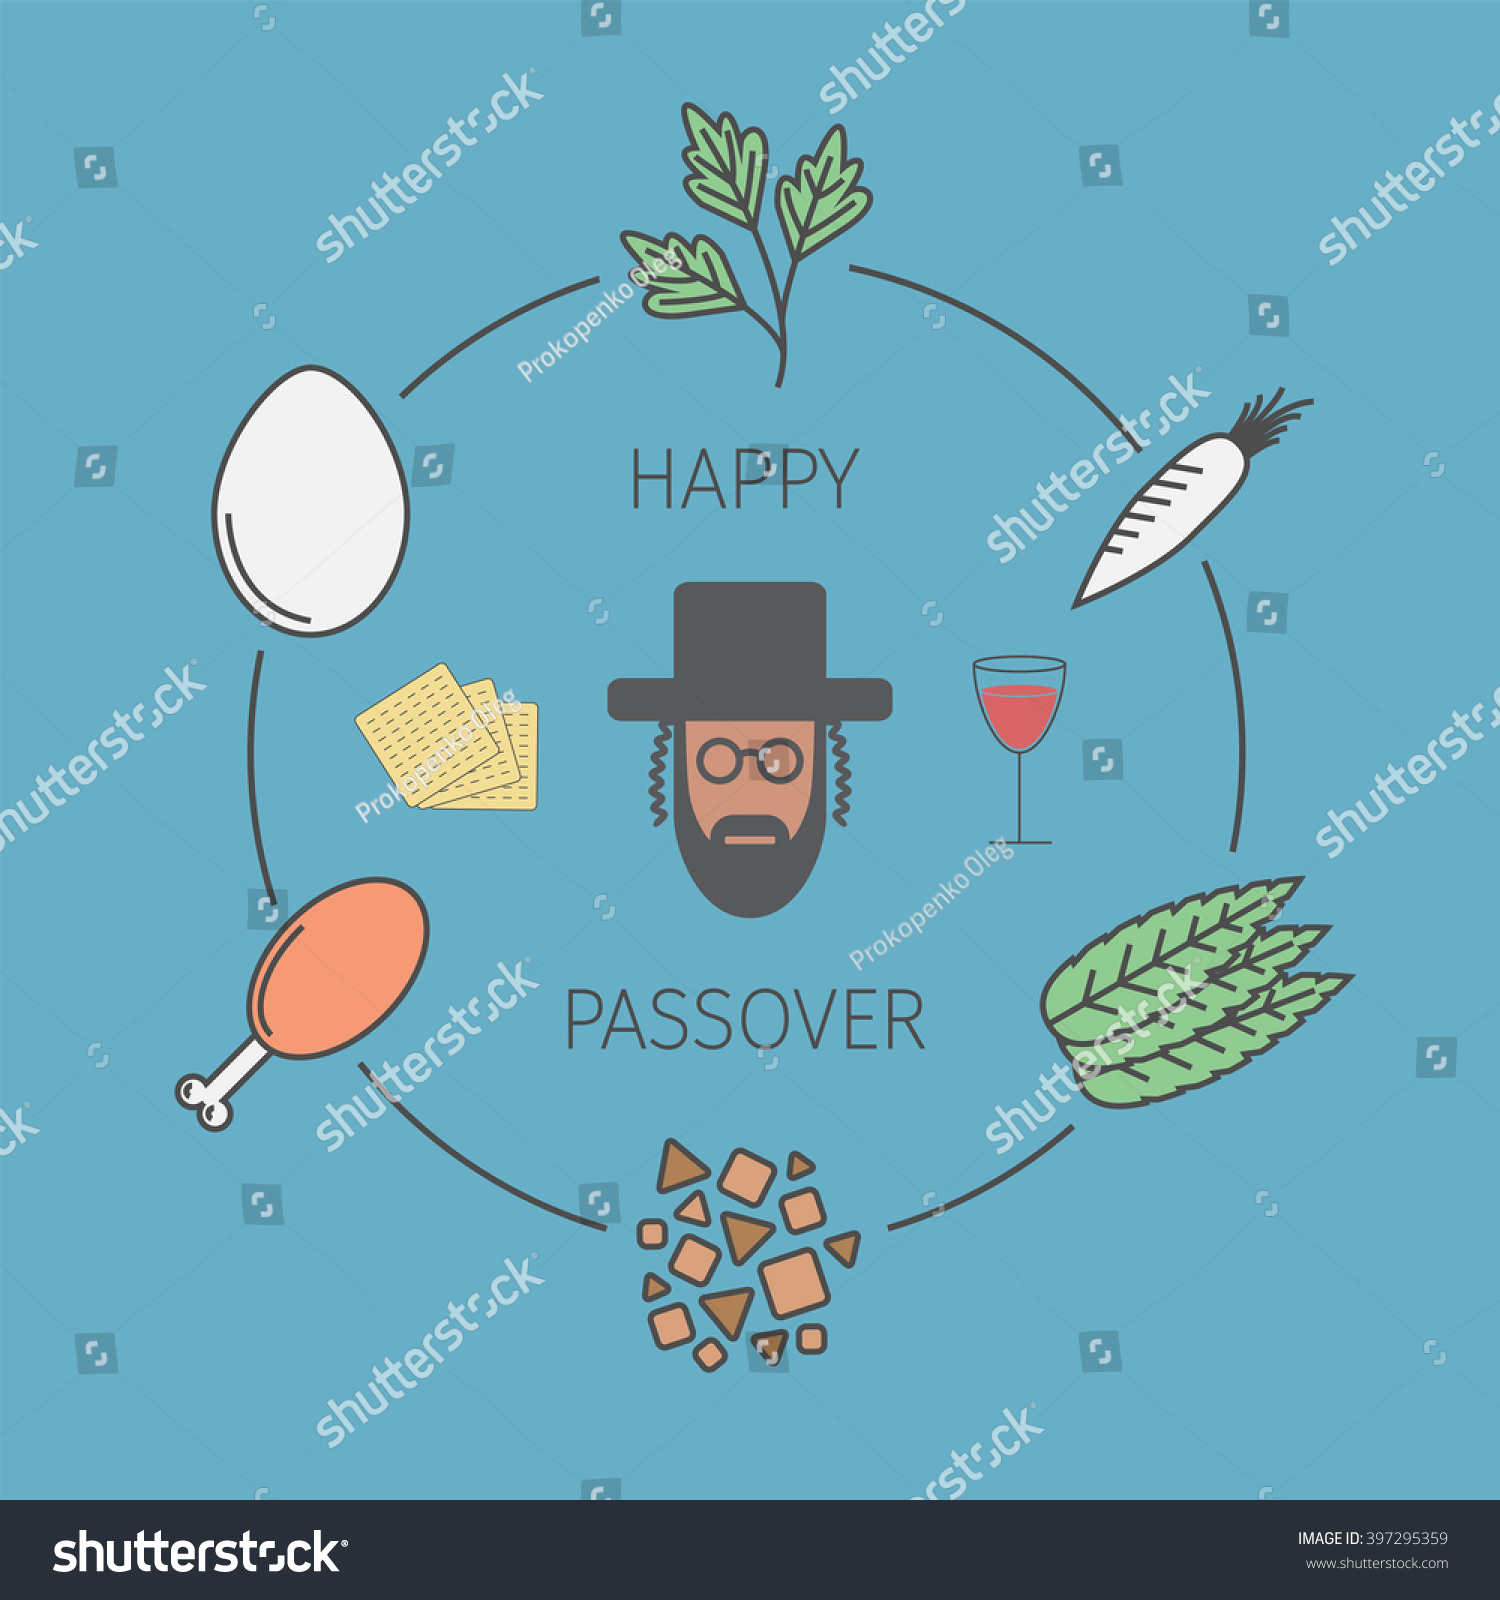 Passover seder plate line icons vector stock vector 397295359 passover seder plate with line icons vector illustration buycottarizona